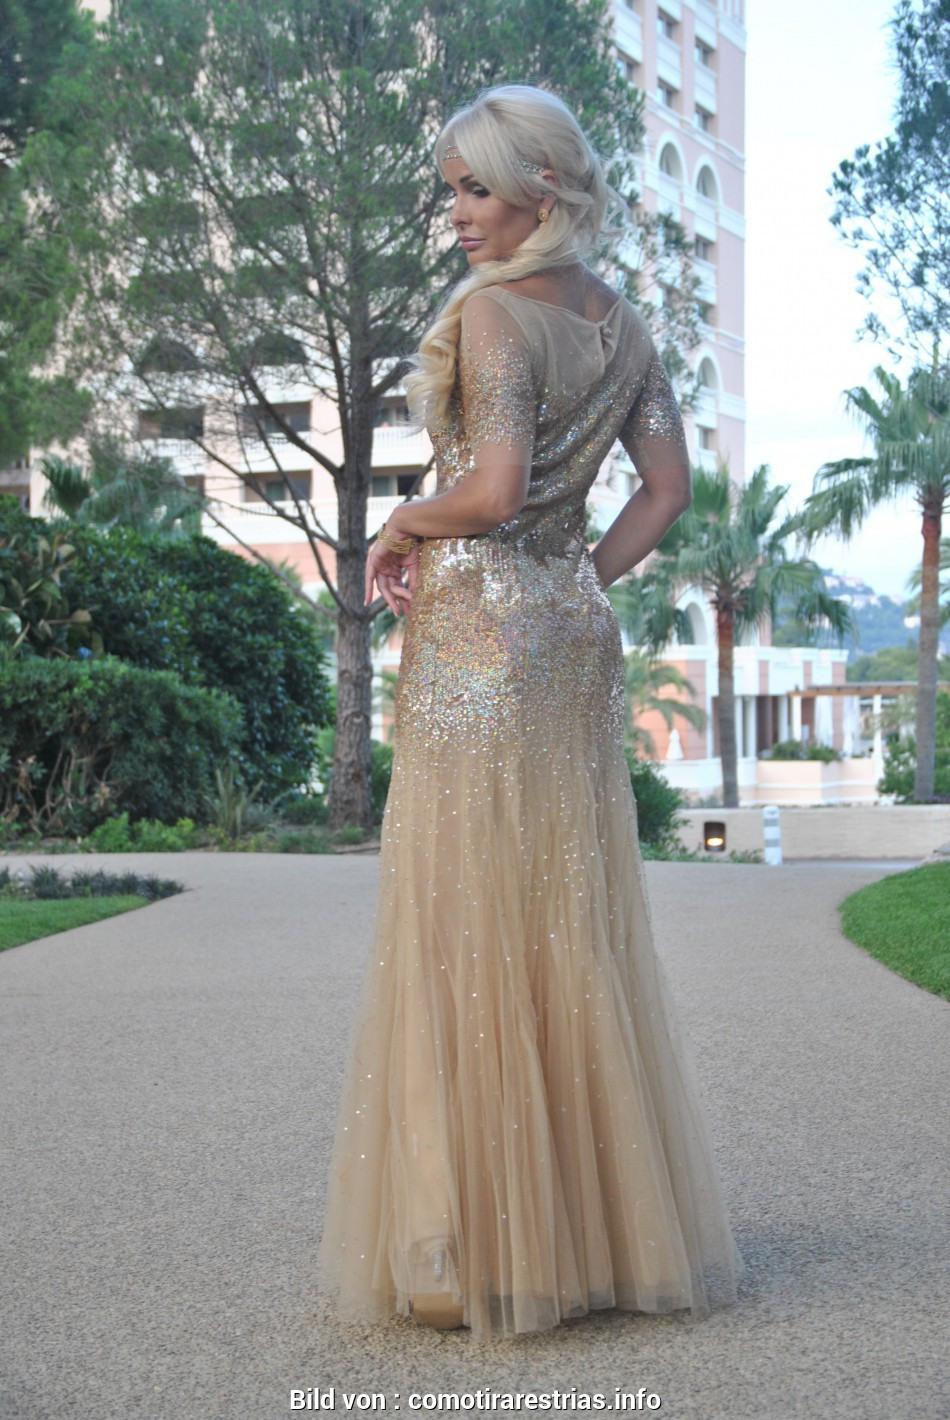 20 Cool Abendkleid Verleih München Spezialgebiet17 Elegant Abendkleid Verleih München Stylish